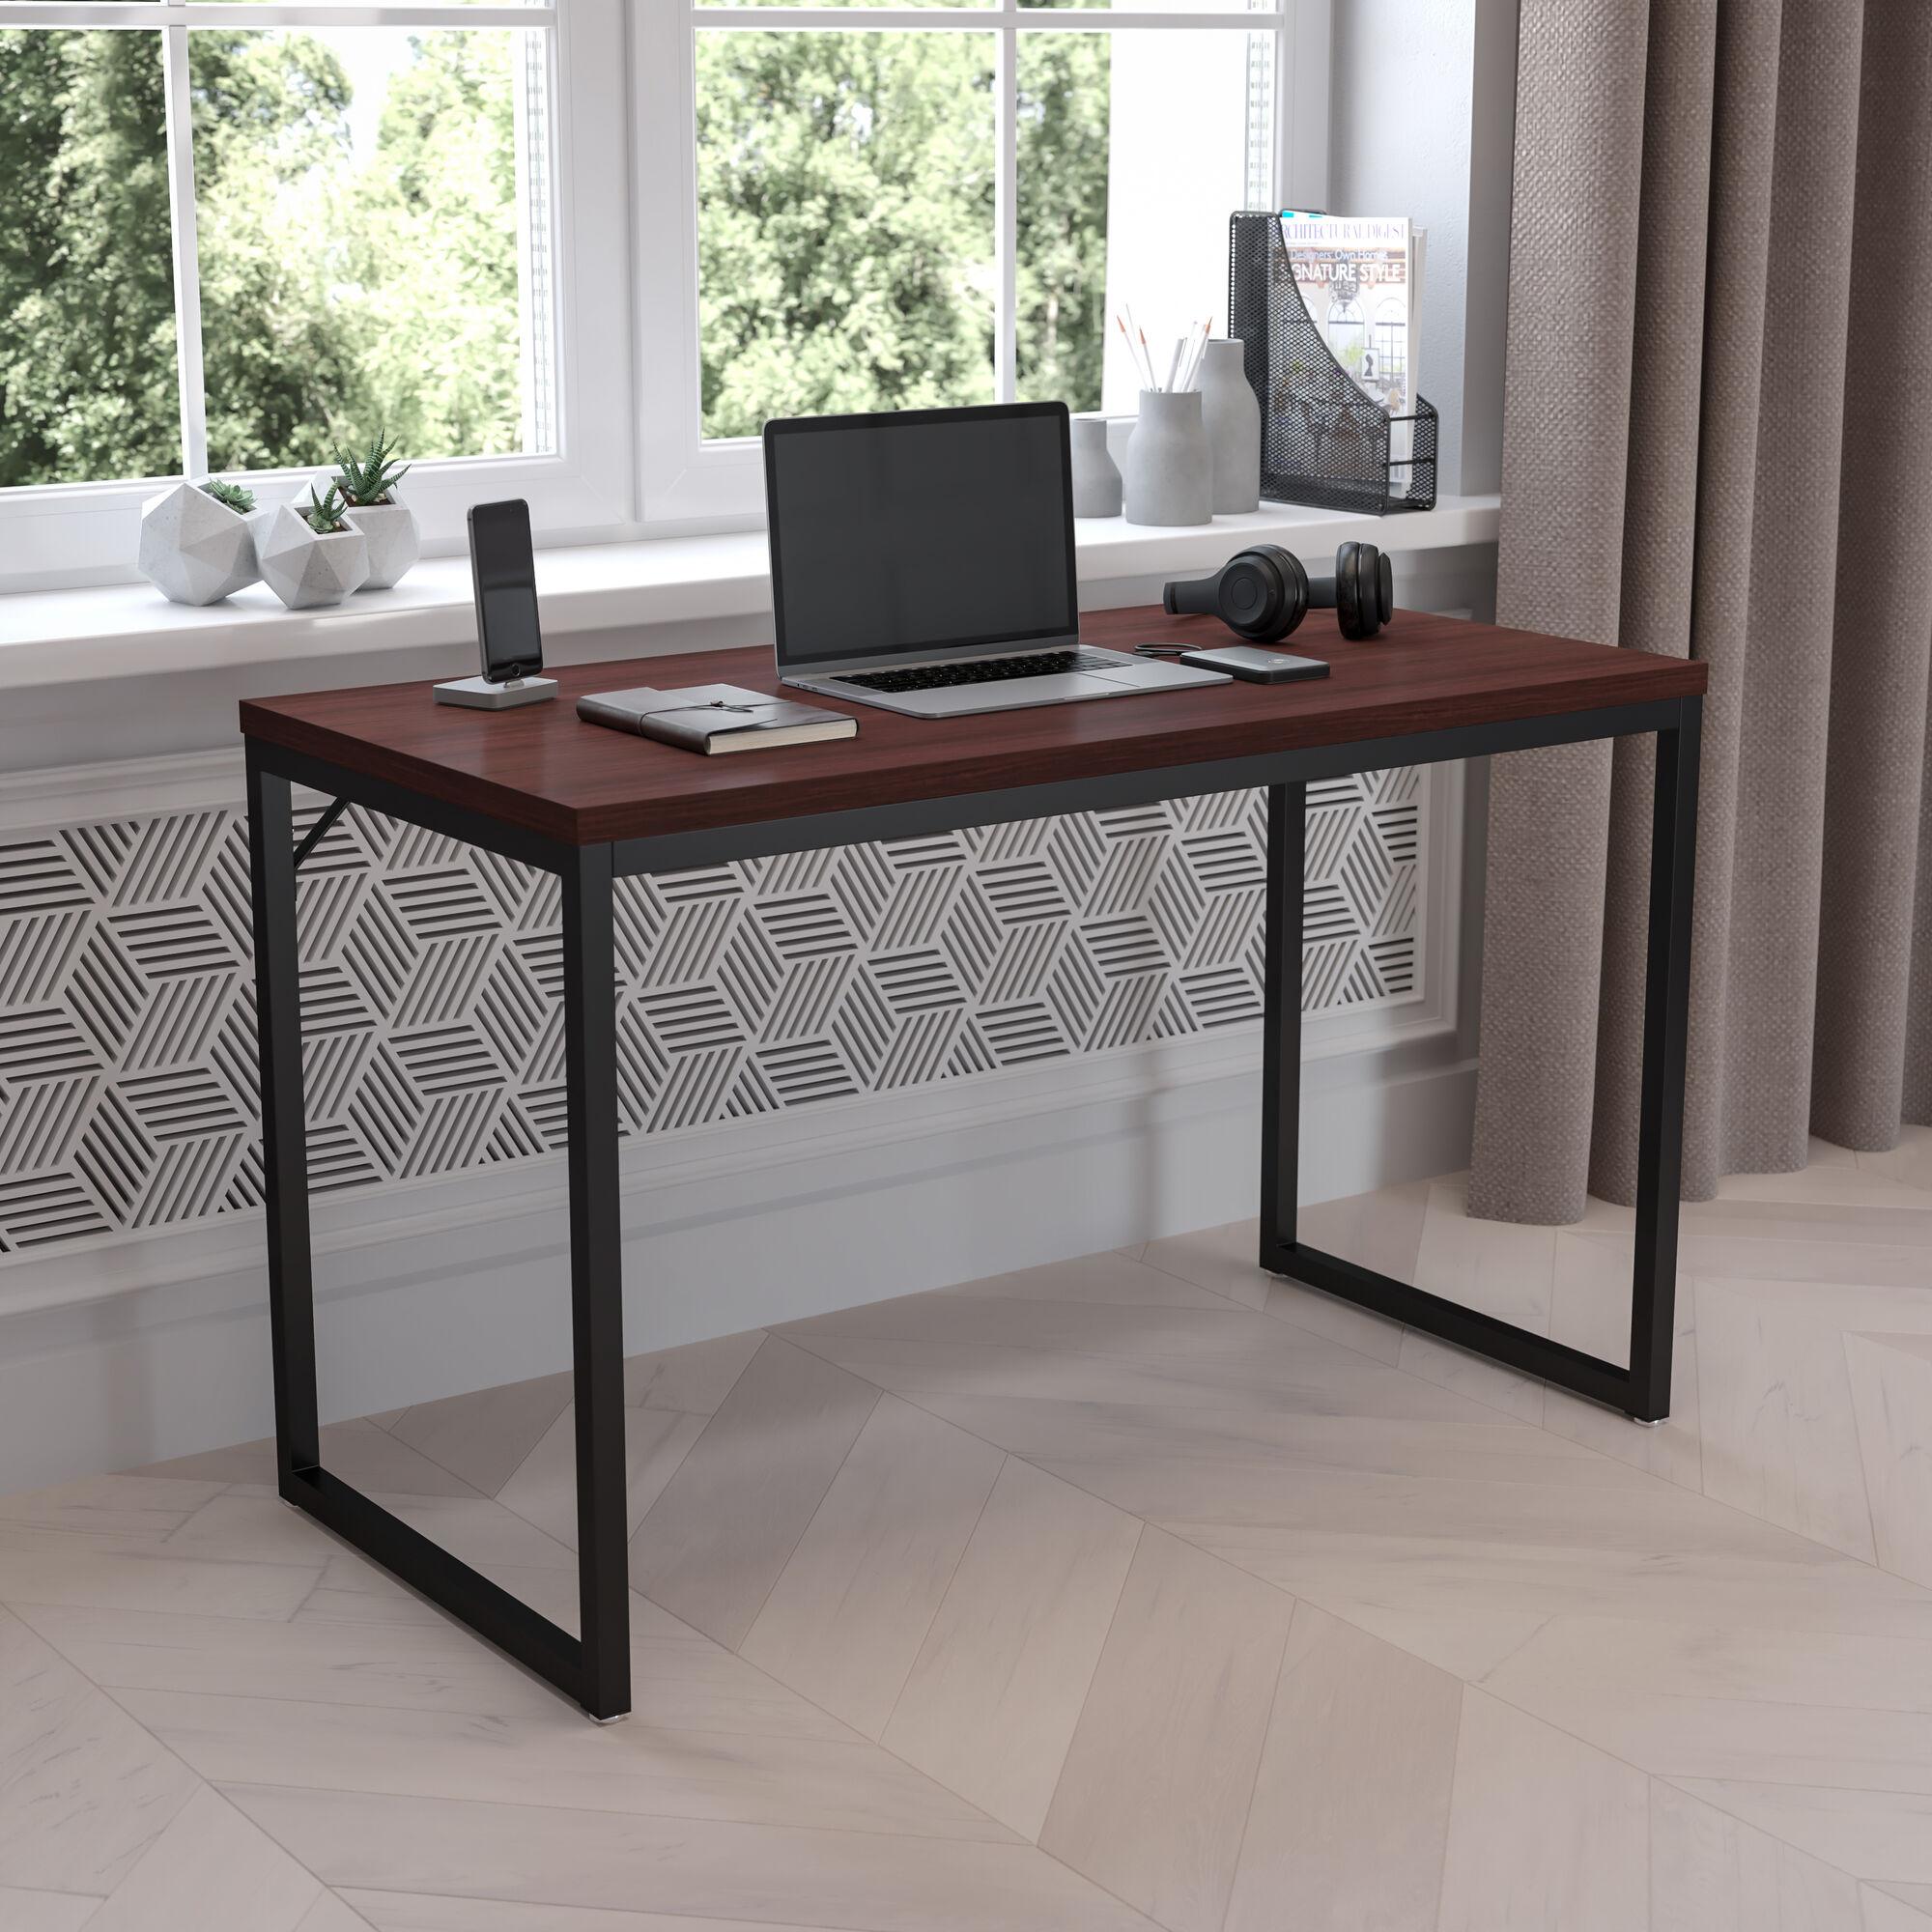 Mahogany Commercial Desk Gc Gf156 12 Mhg Gg Bizchair Com